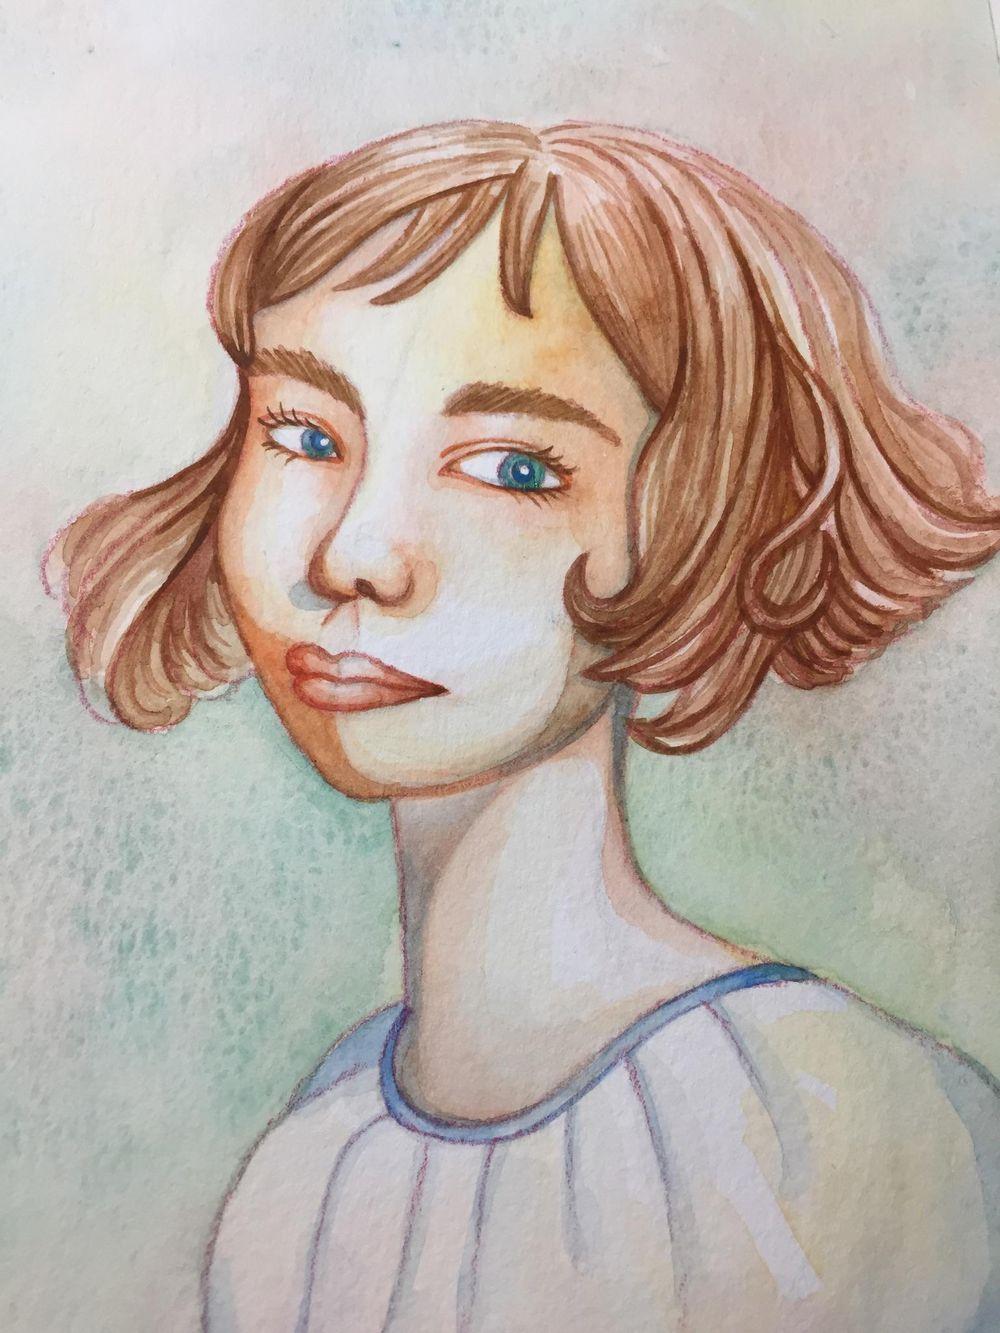 Rainbow Skin Portrait - image 4 - student project